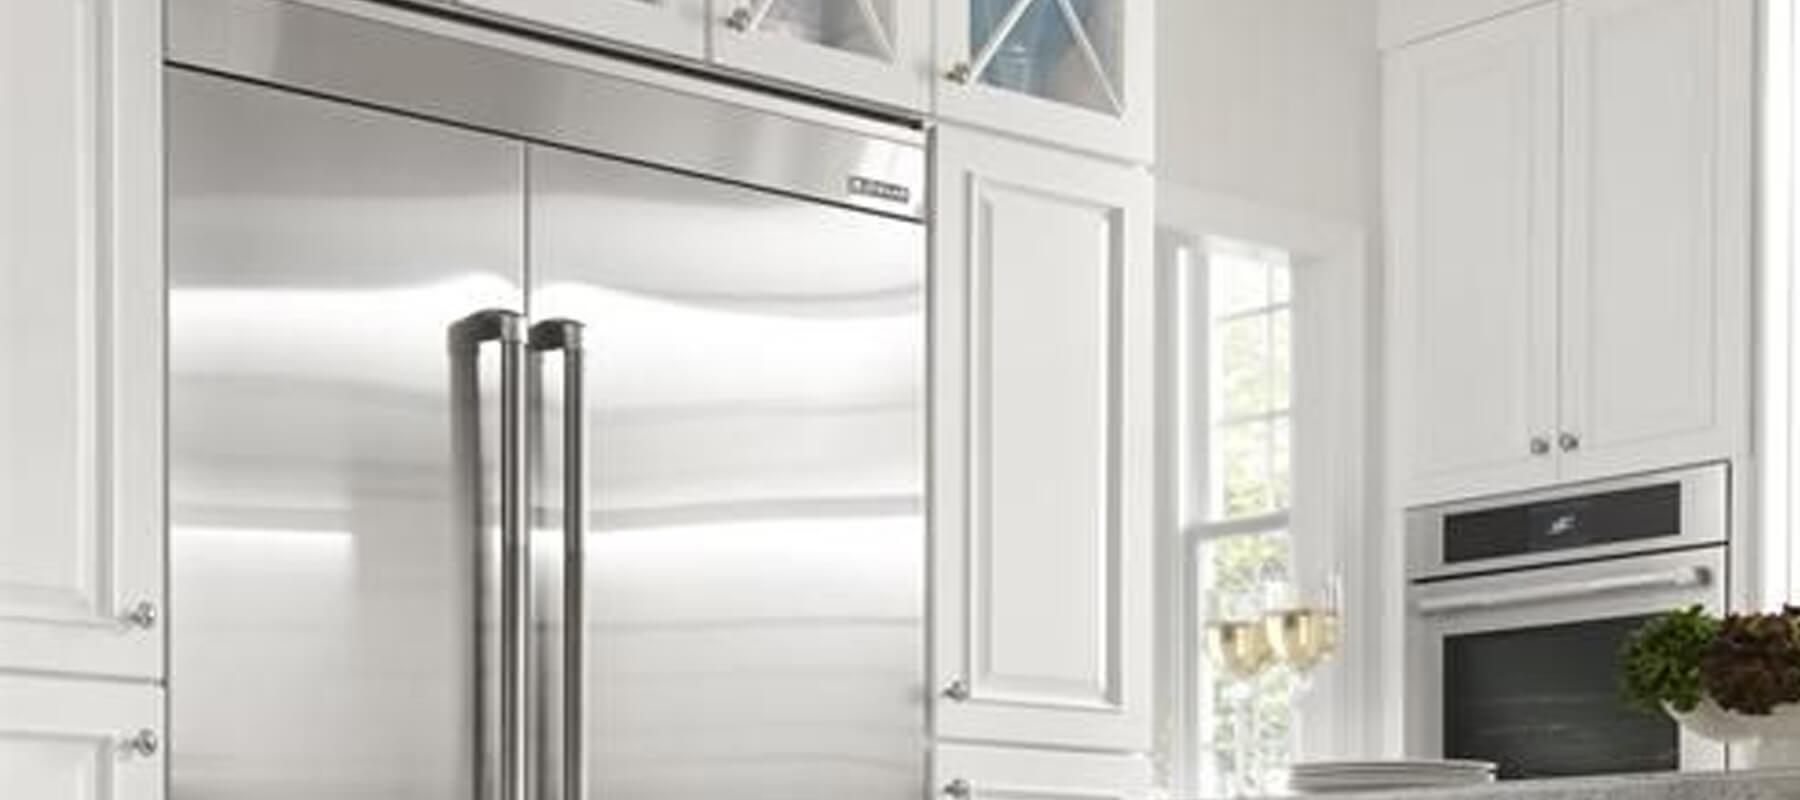 Built in Wine Refrigerator Long Beach | Built-in Refrigerator Repair